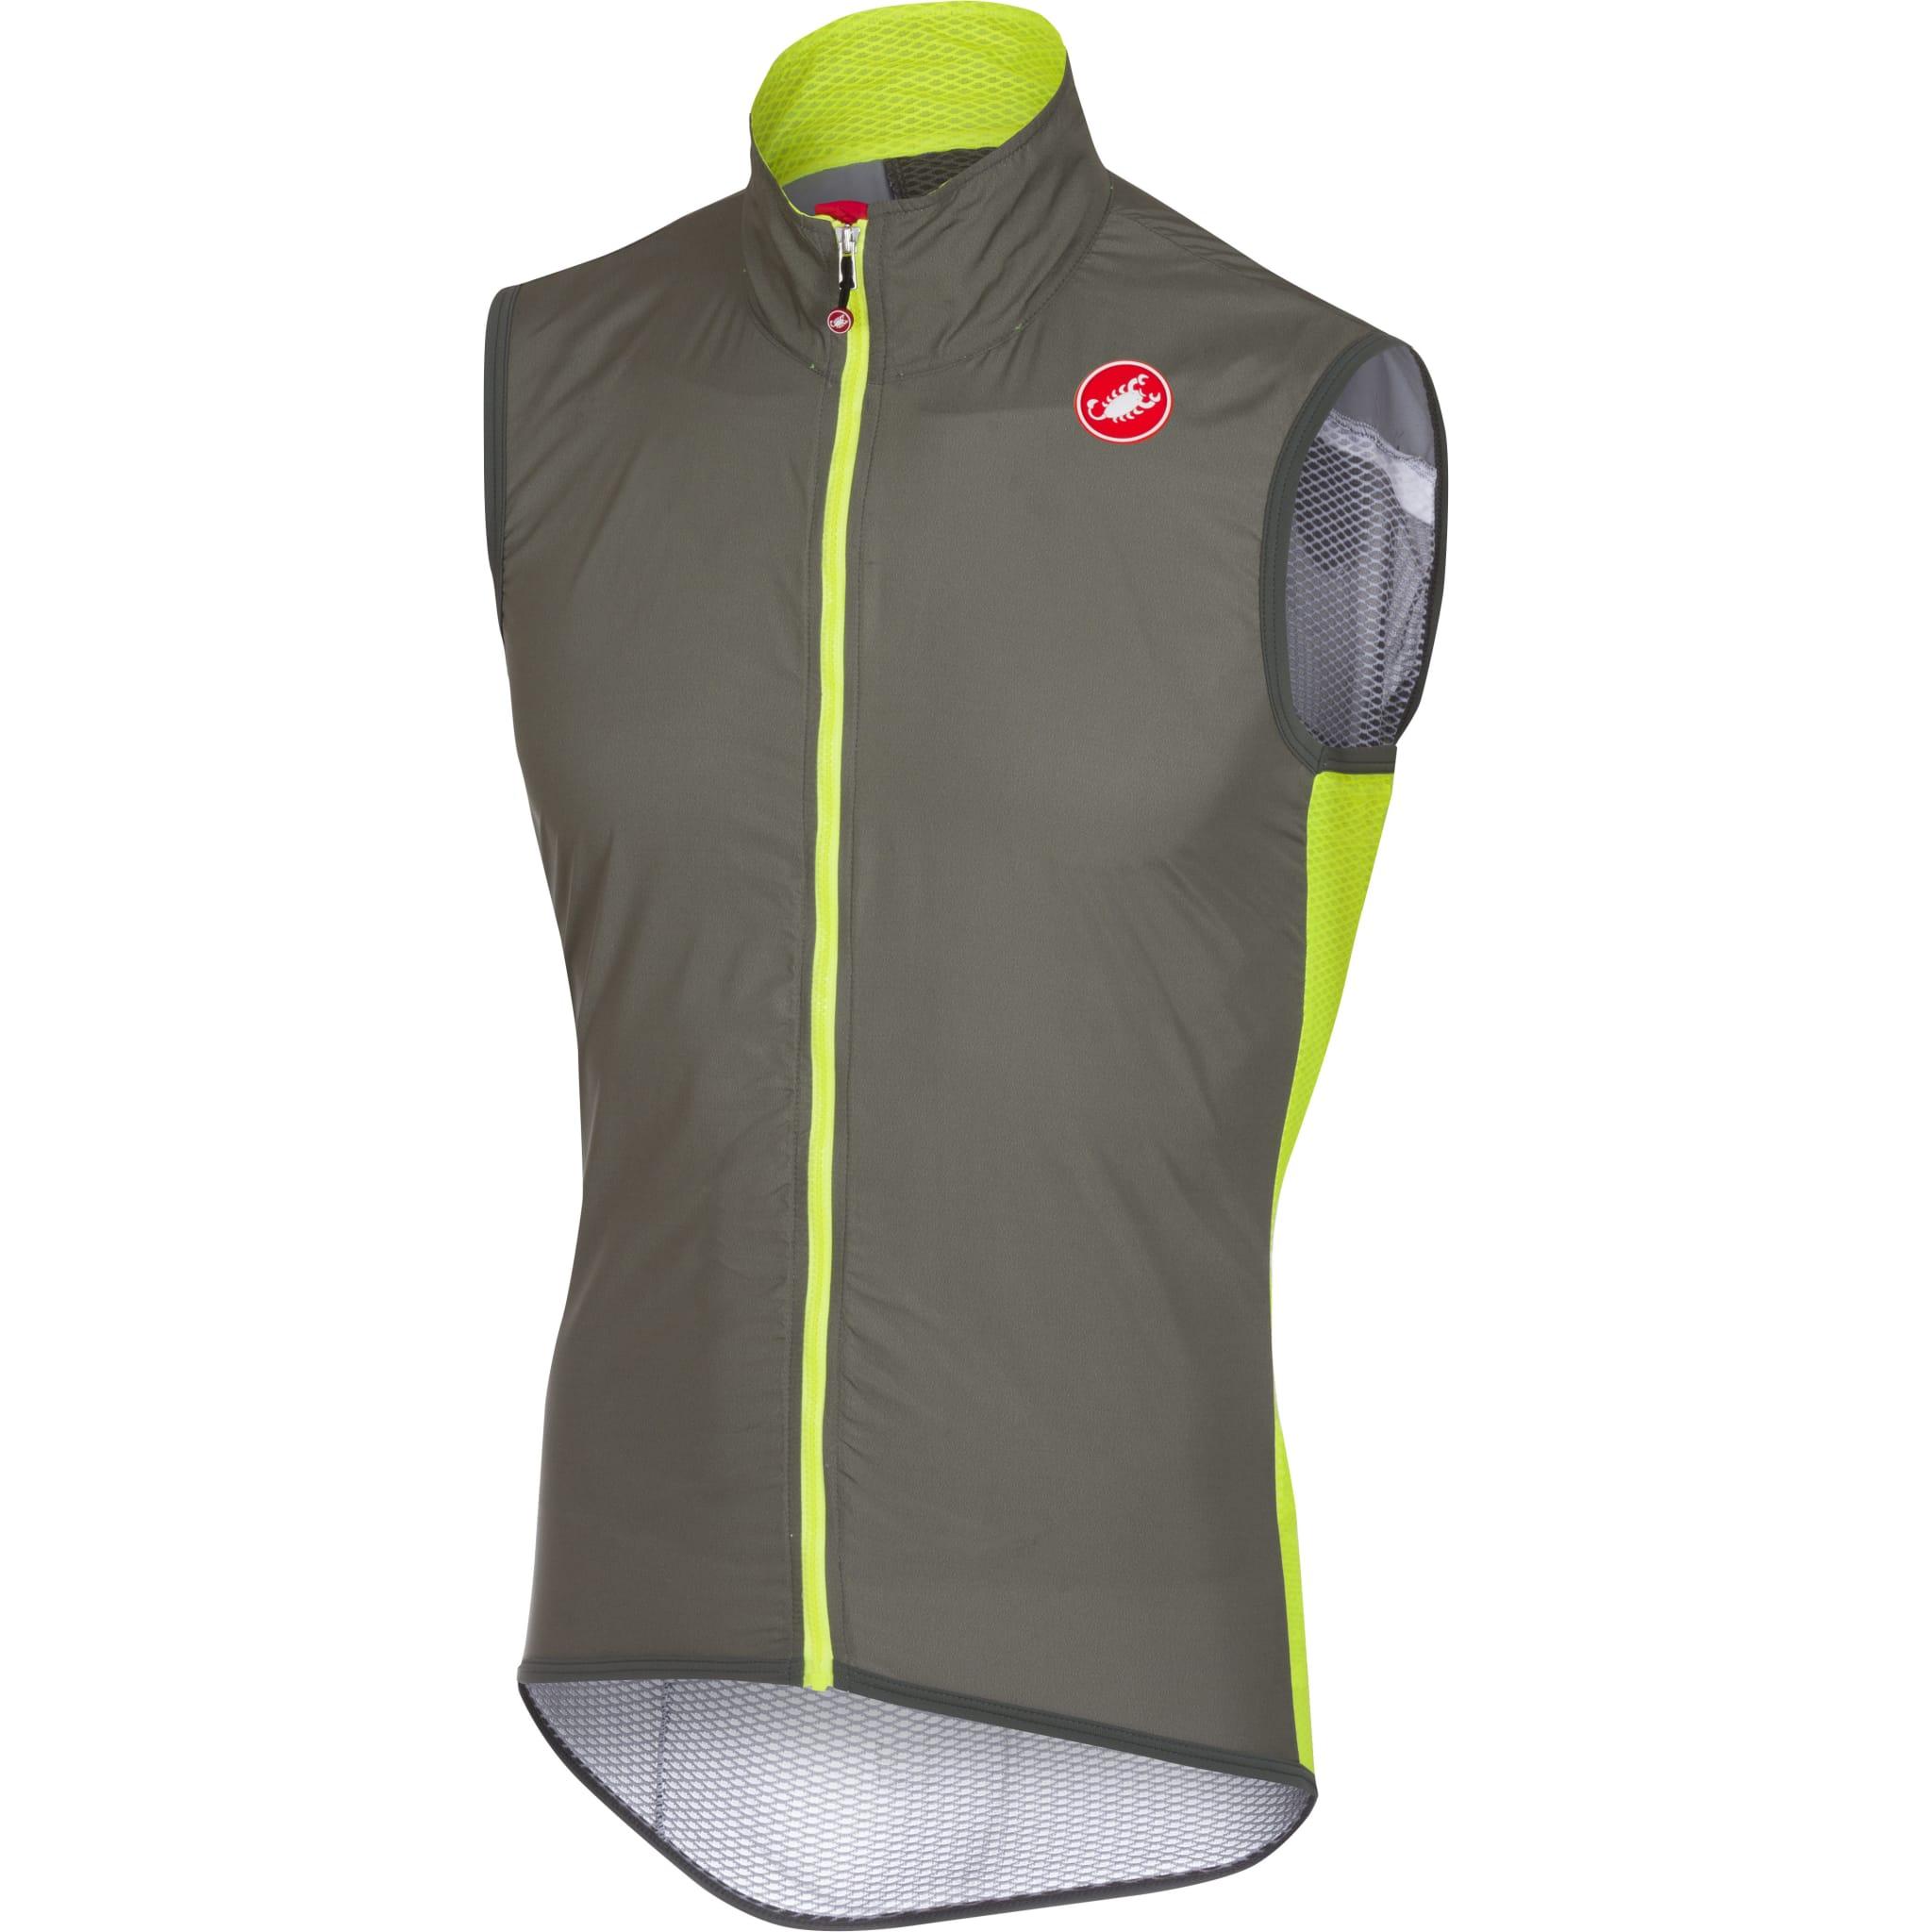 Pro Light Wind Vest